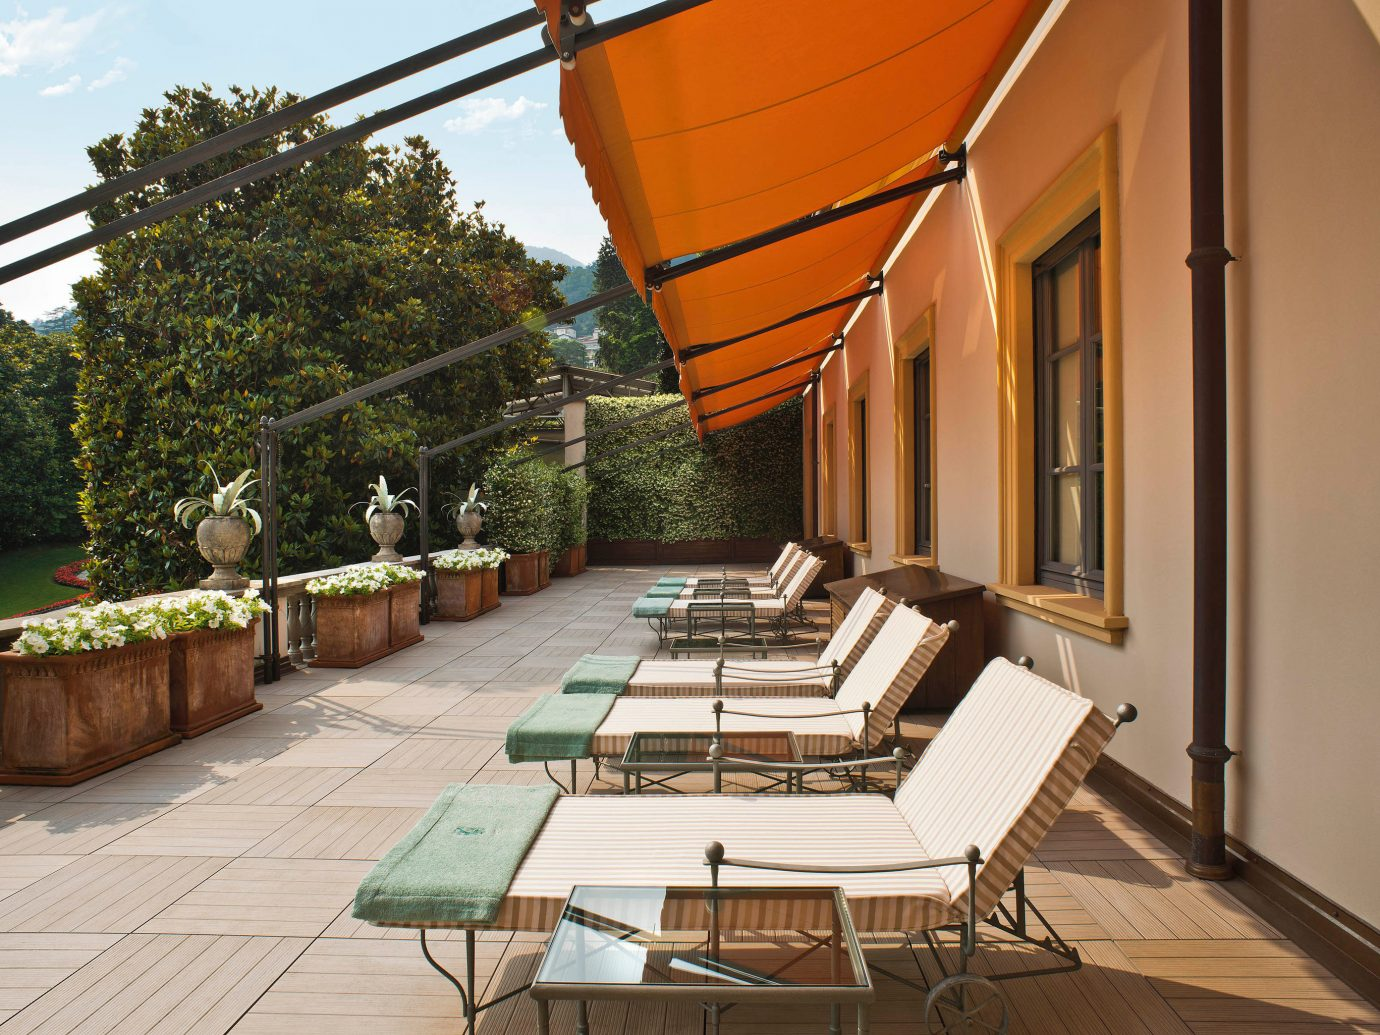 Hotels Luxury Travel outdoor property house outdoor structure home estate backyard Villa interior design cottage furniture